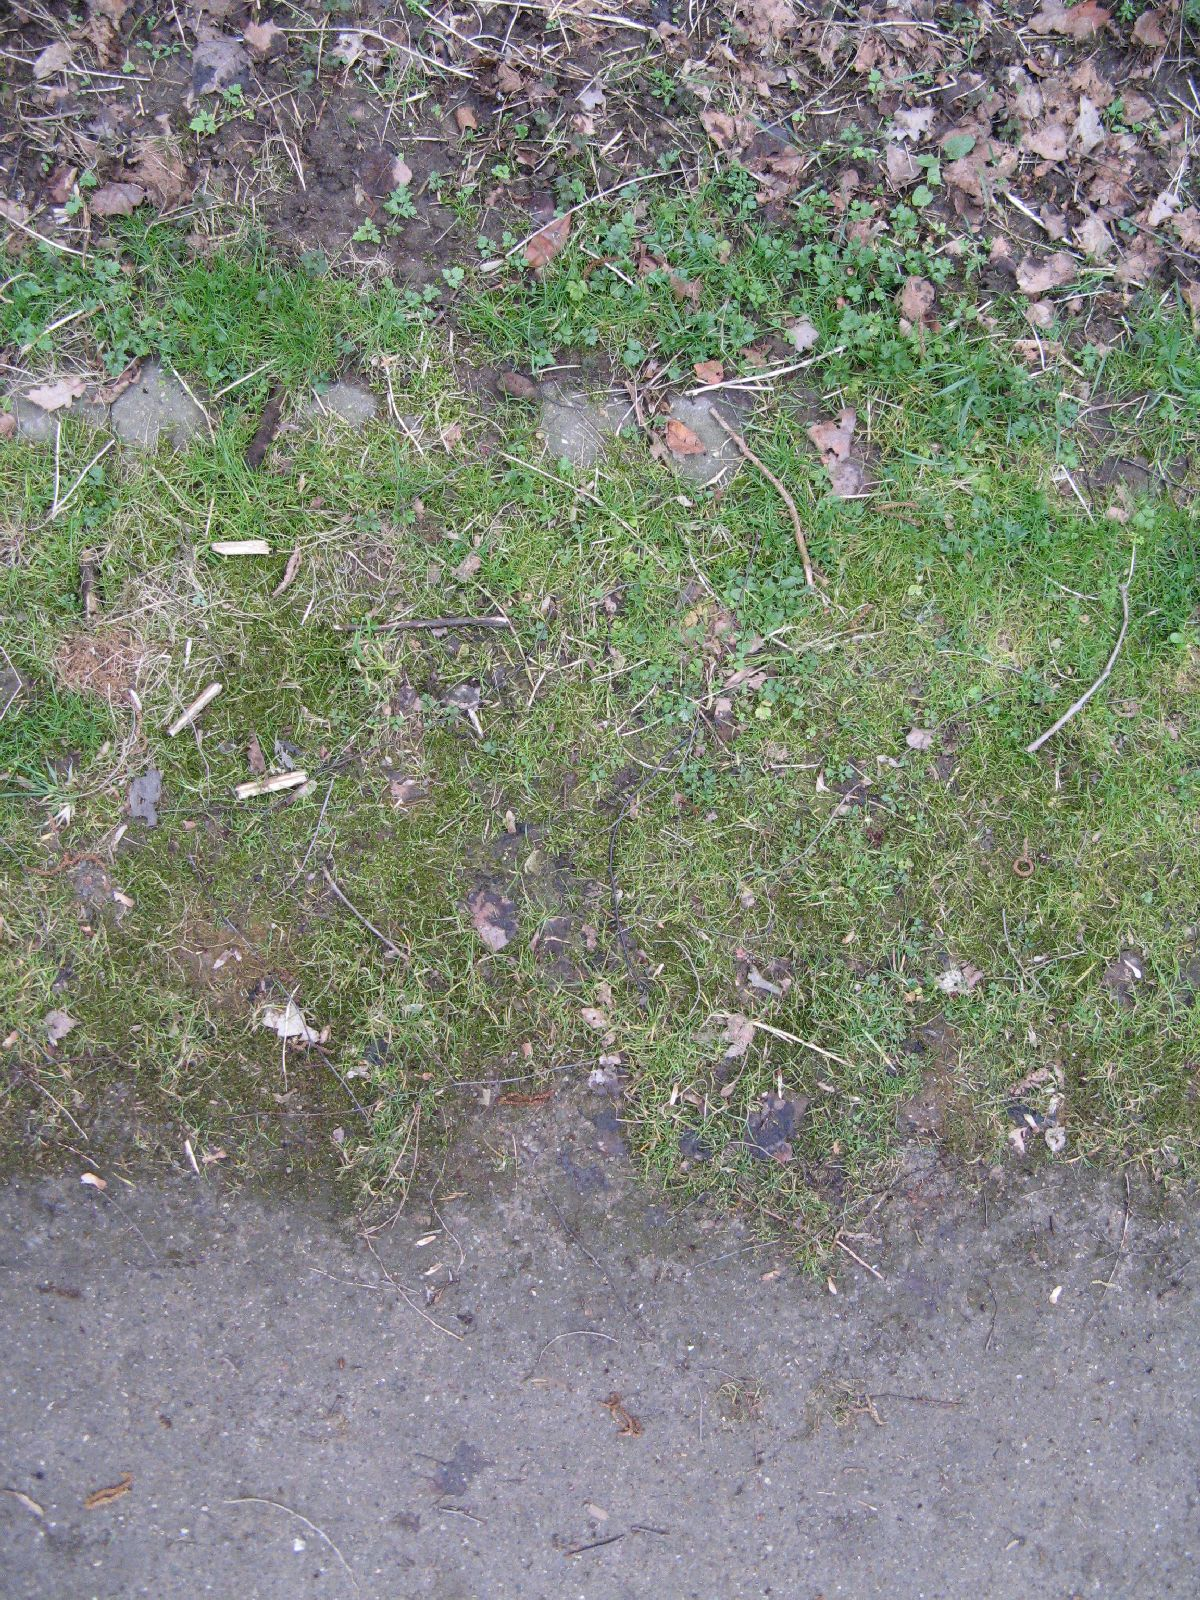 Boden-Gras-Moos-Blumen_Textur_B_5593